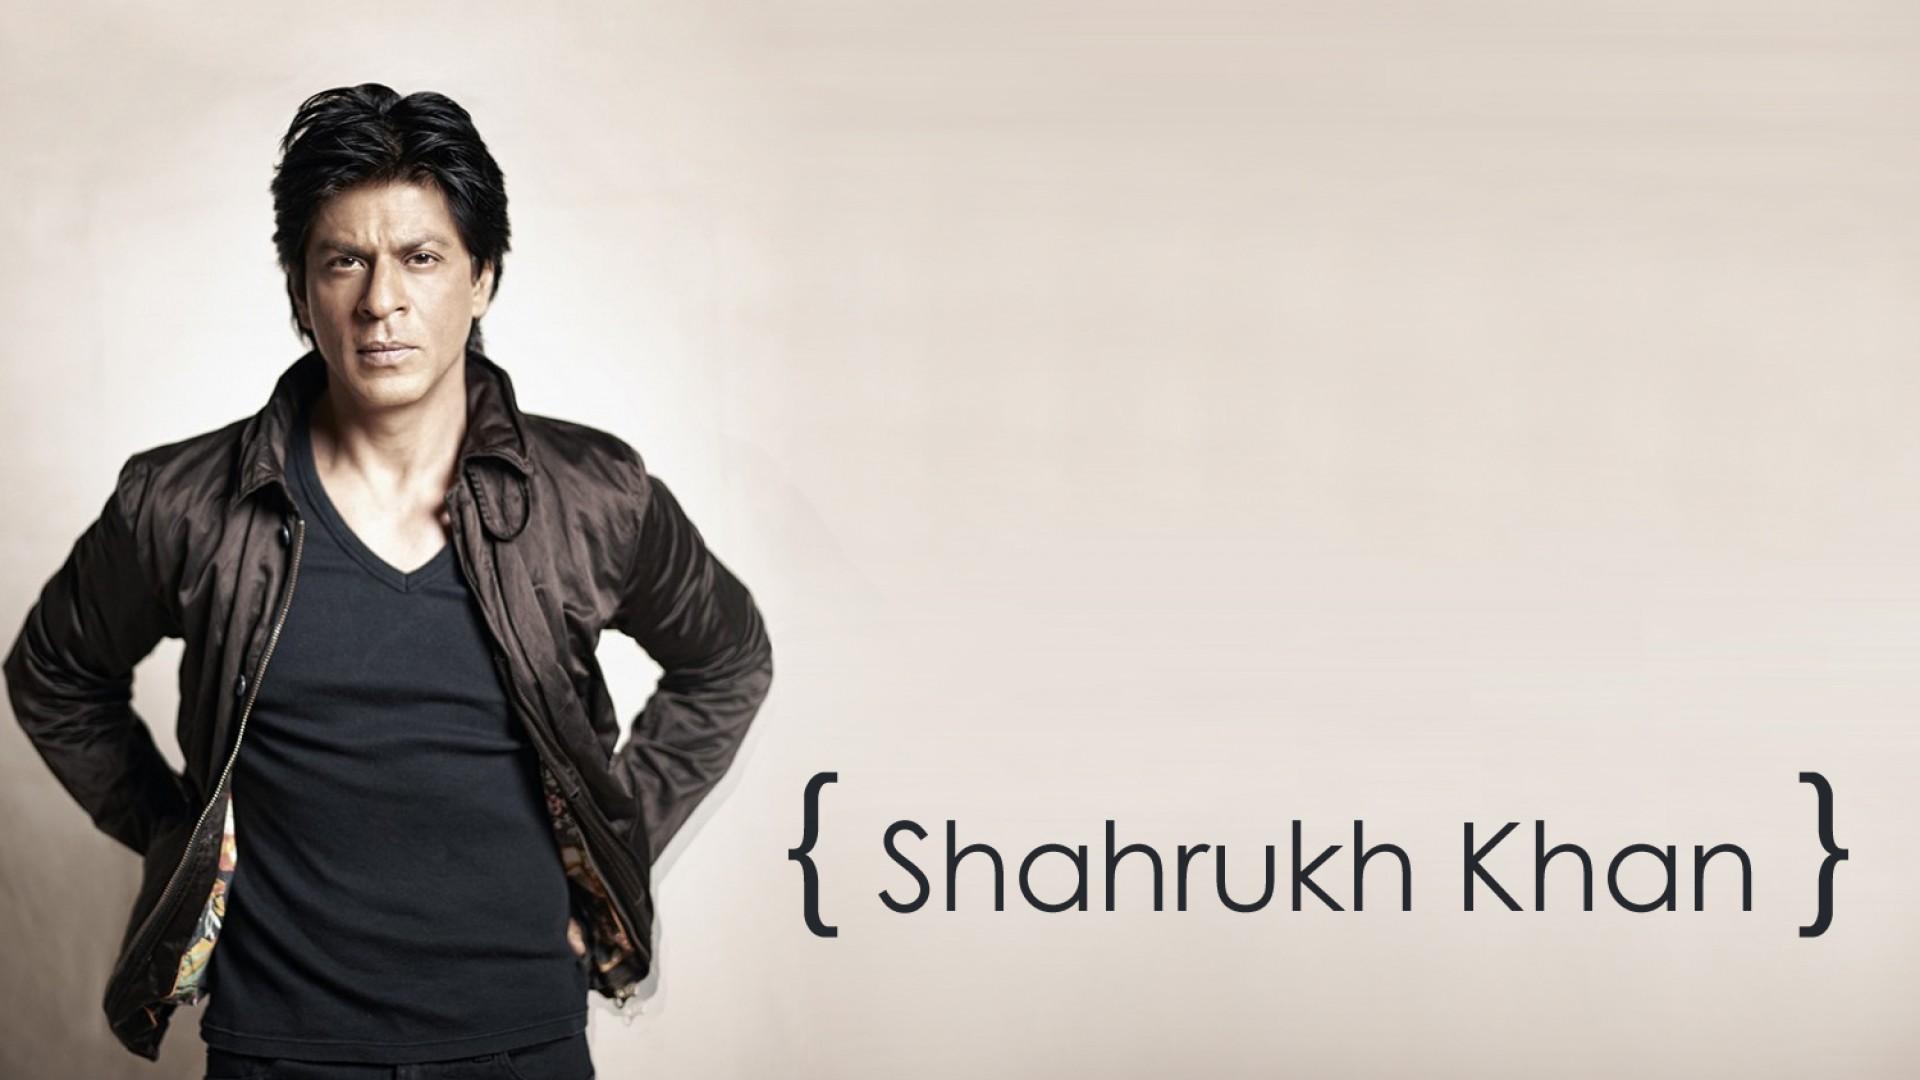 download shah rukh khan photoshoot 1080x1920 resolution, full hd